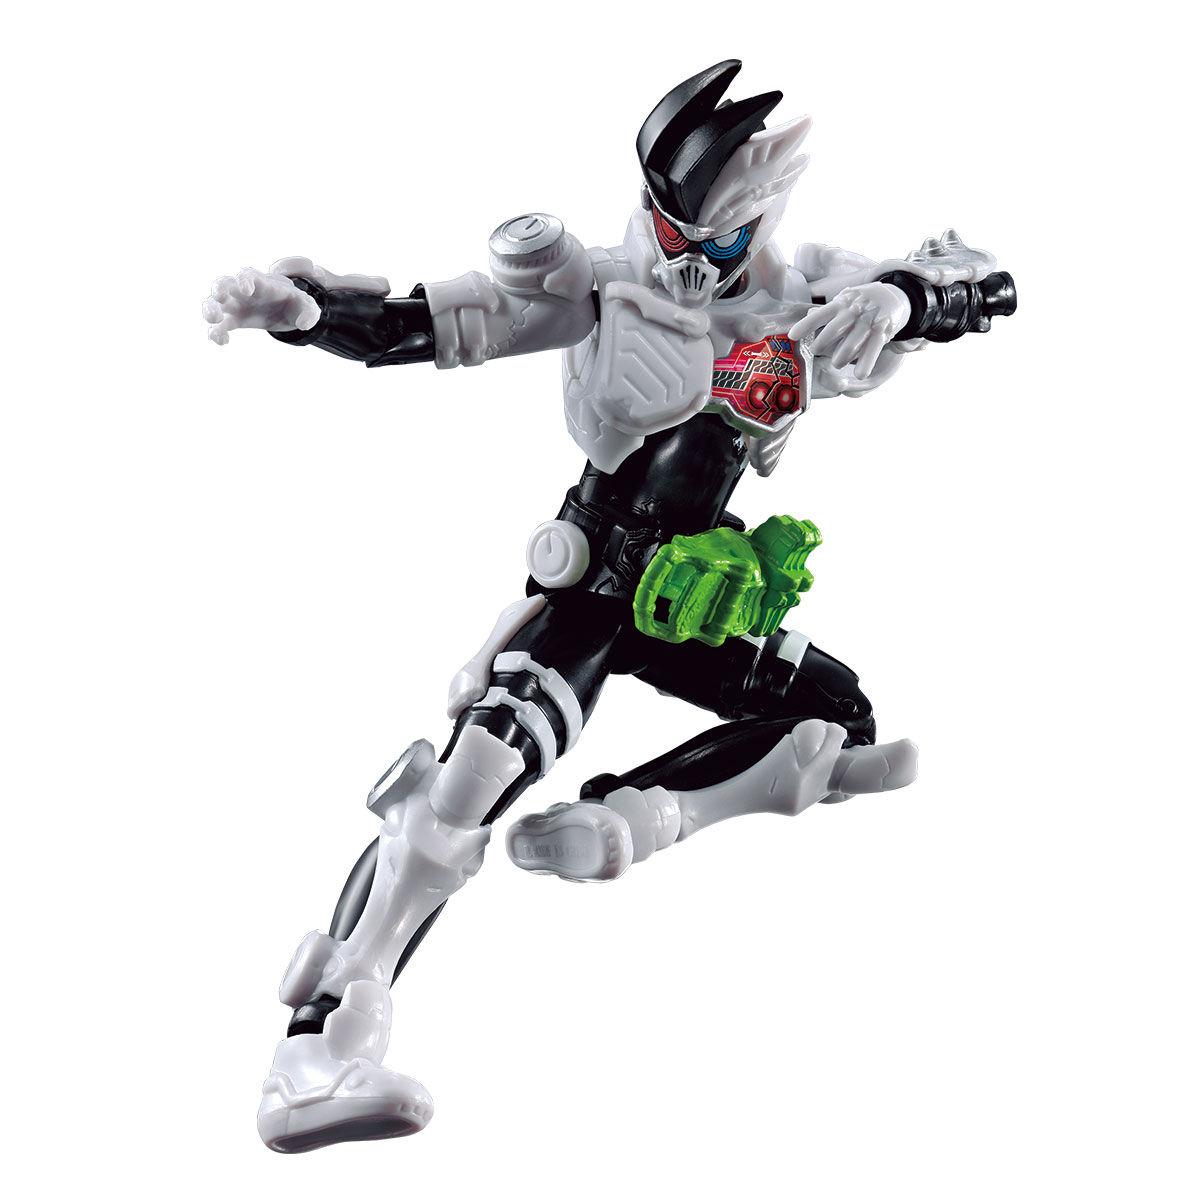 RKF RIDER KICK'S FIGURE 仮面ライダーゲンム ゾンビアクションゲーマー レベルX-0